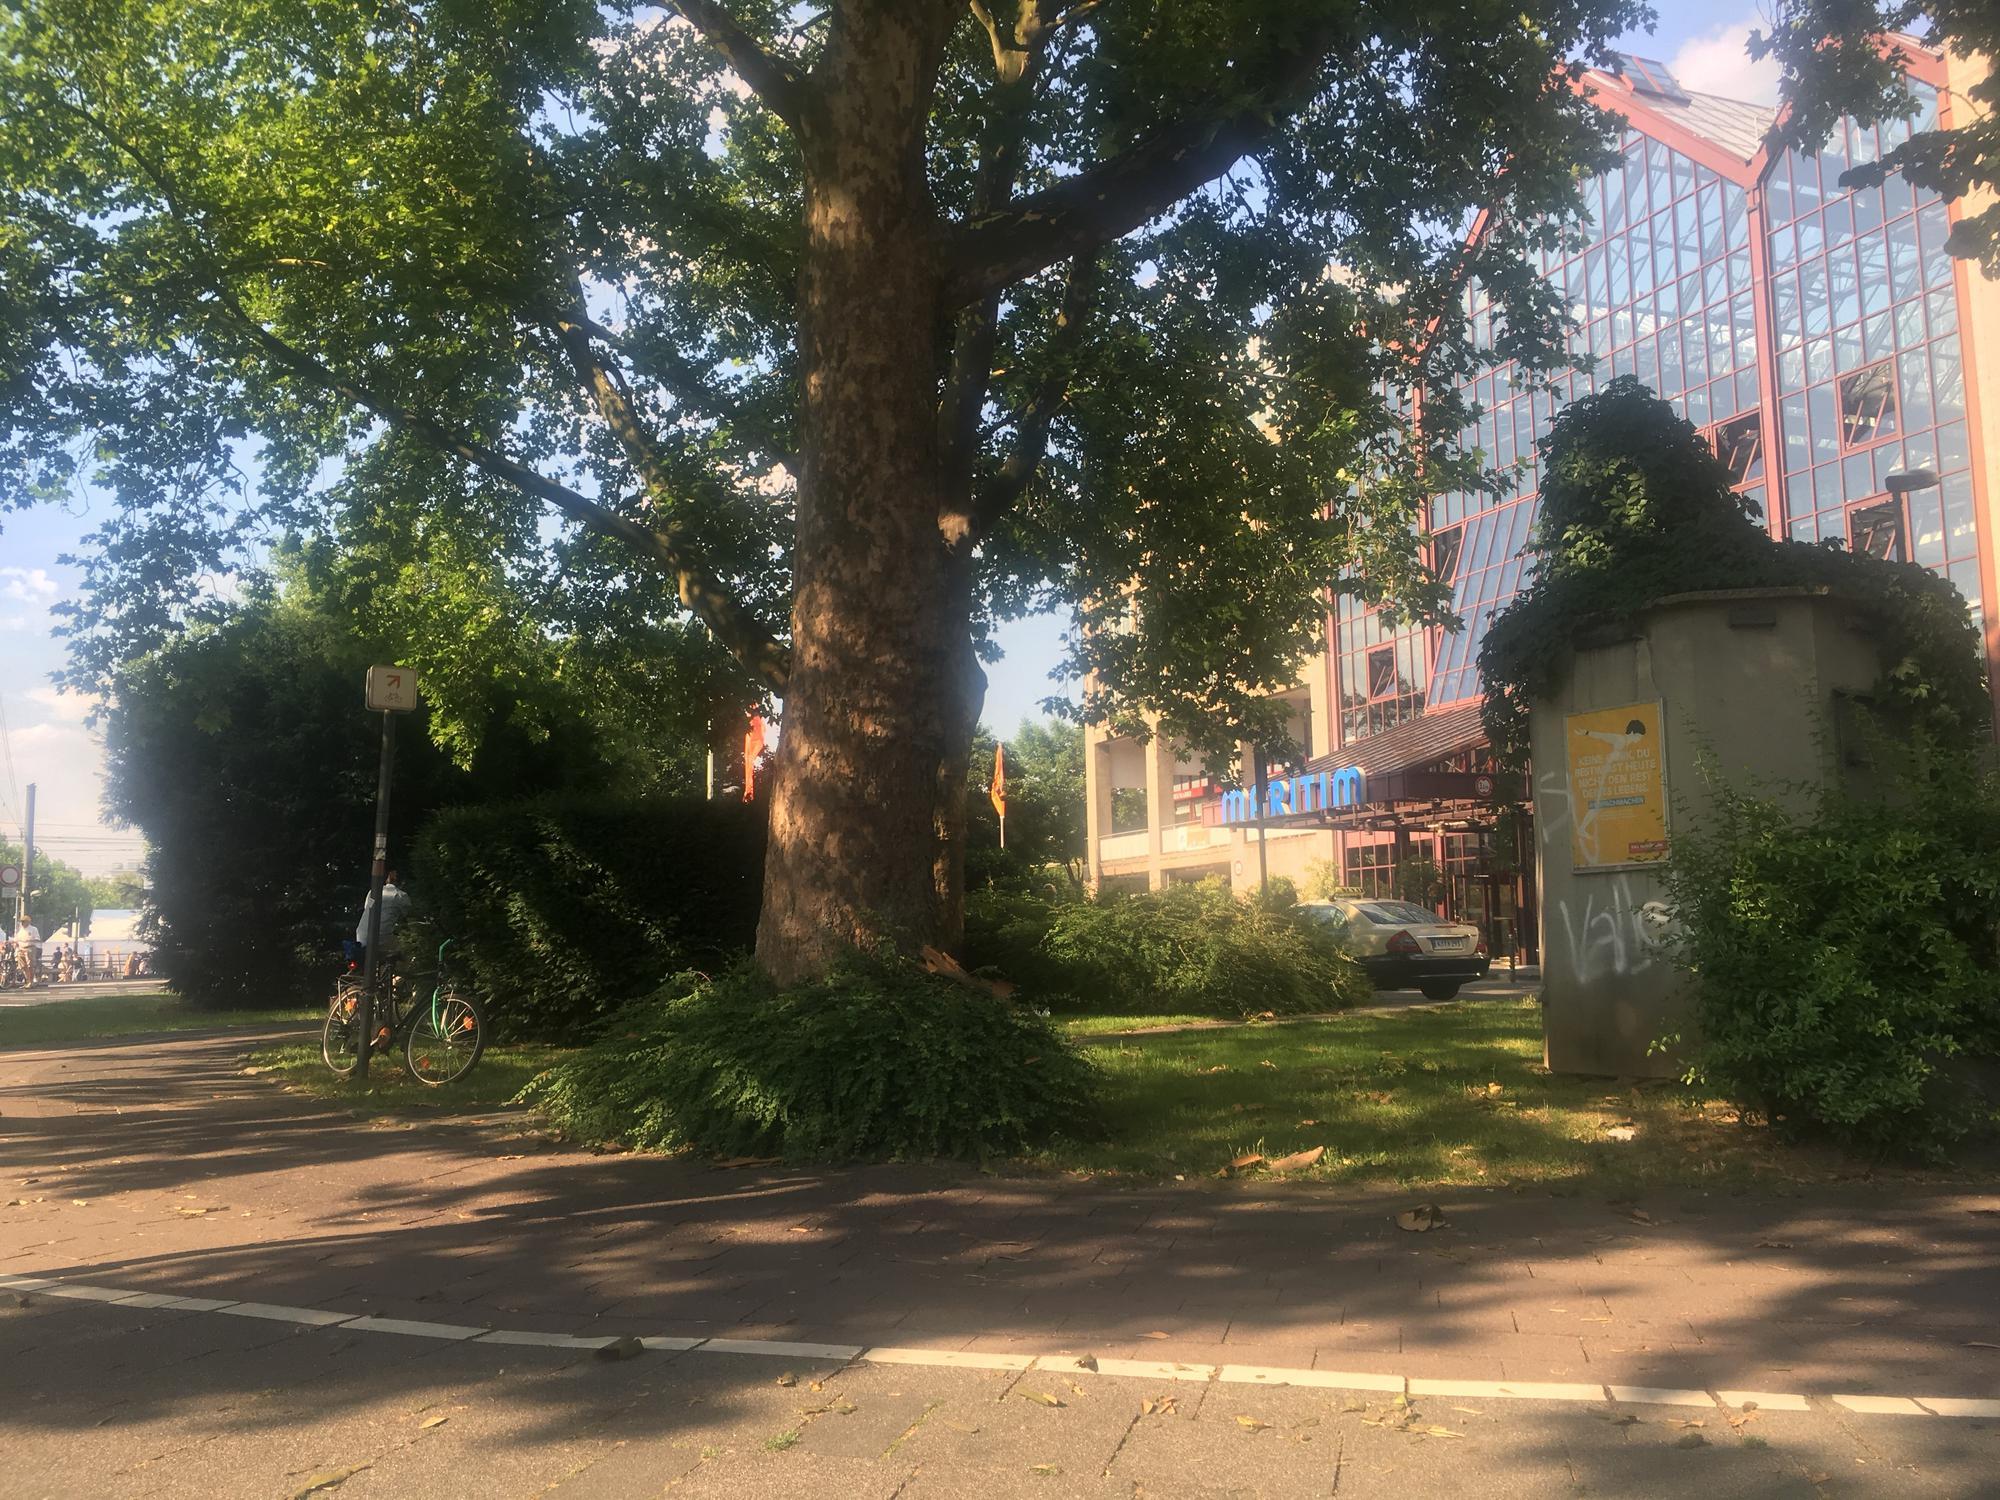 🇩🇪 Кёльн, Германия, июль 2017.